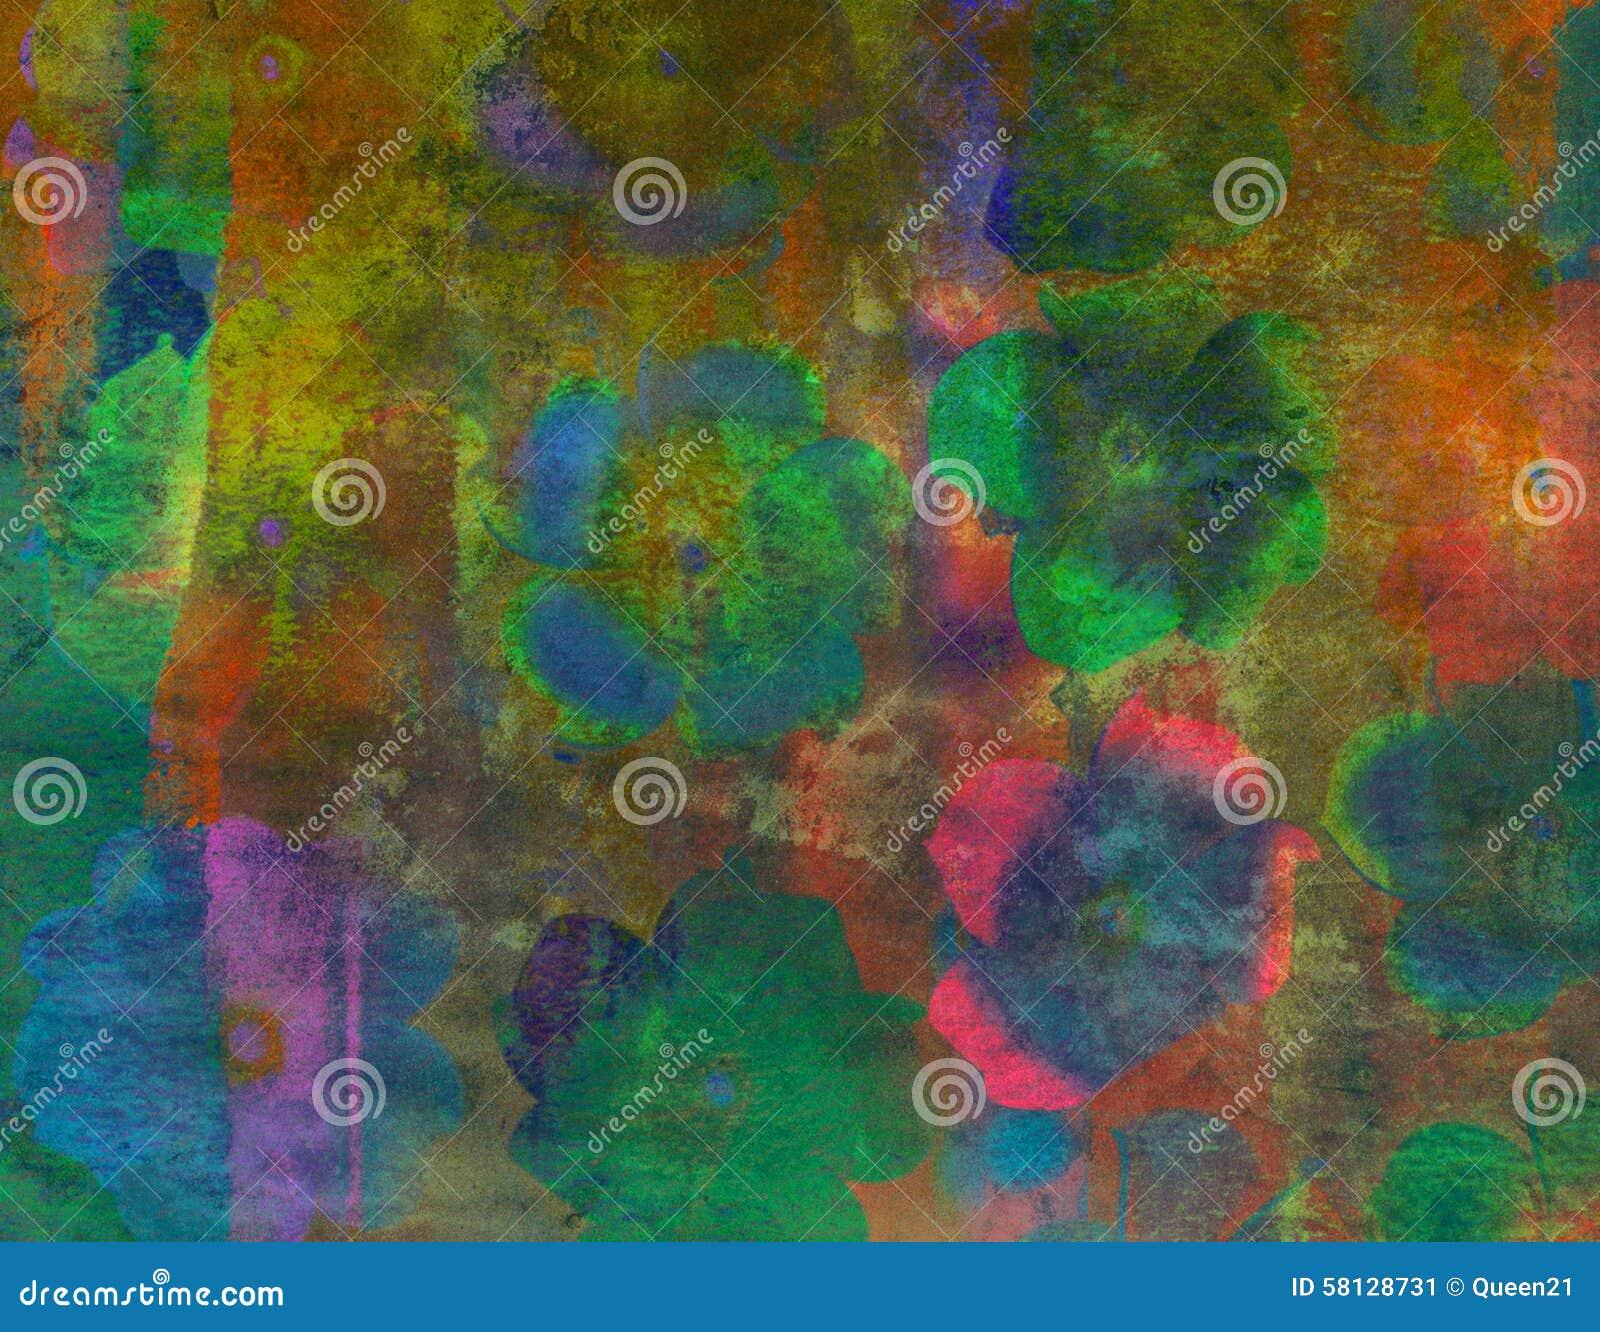 color paint background stock illustration illustration of splash